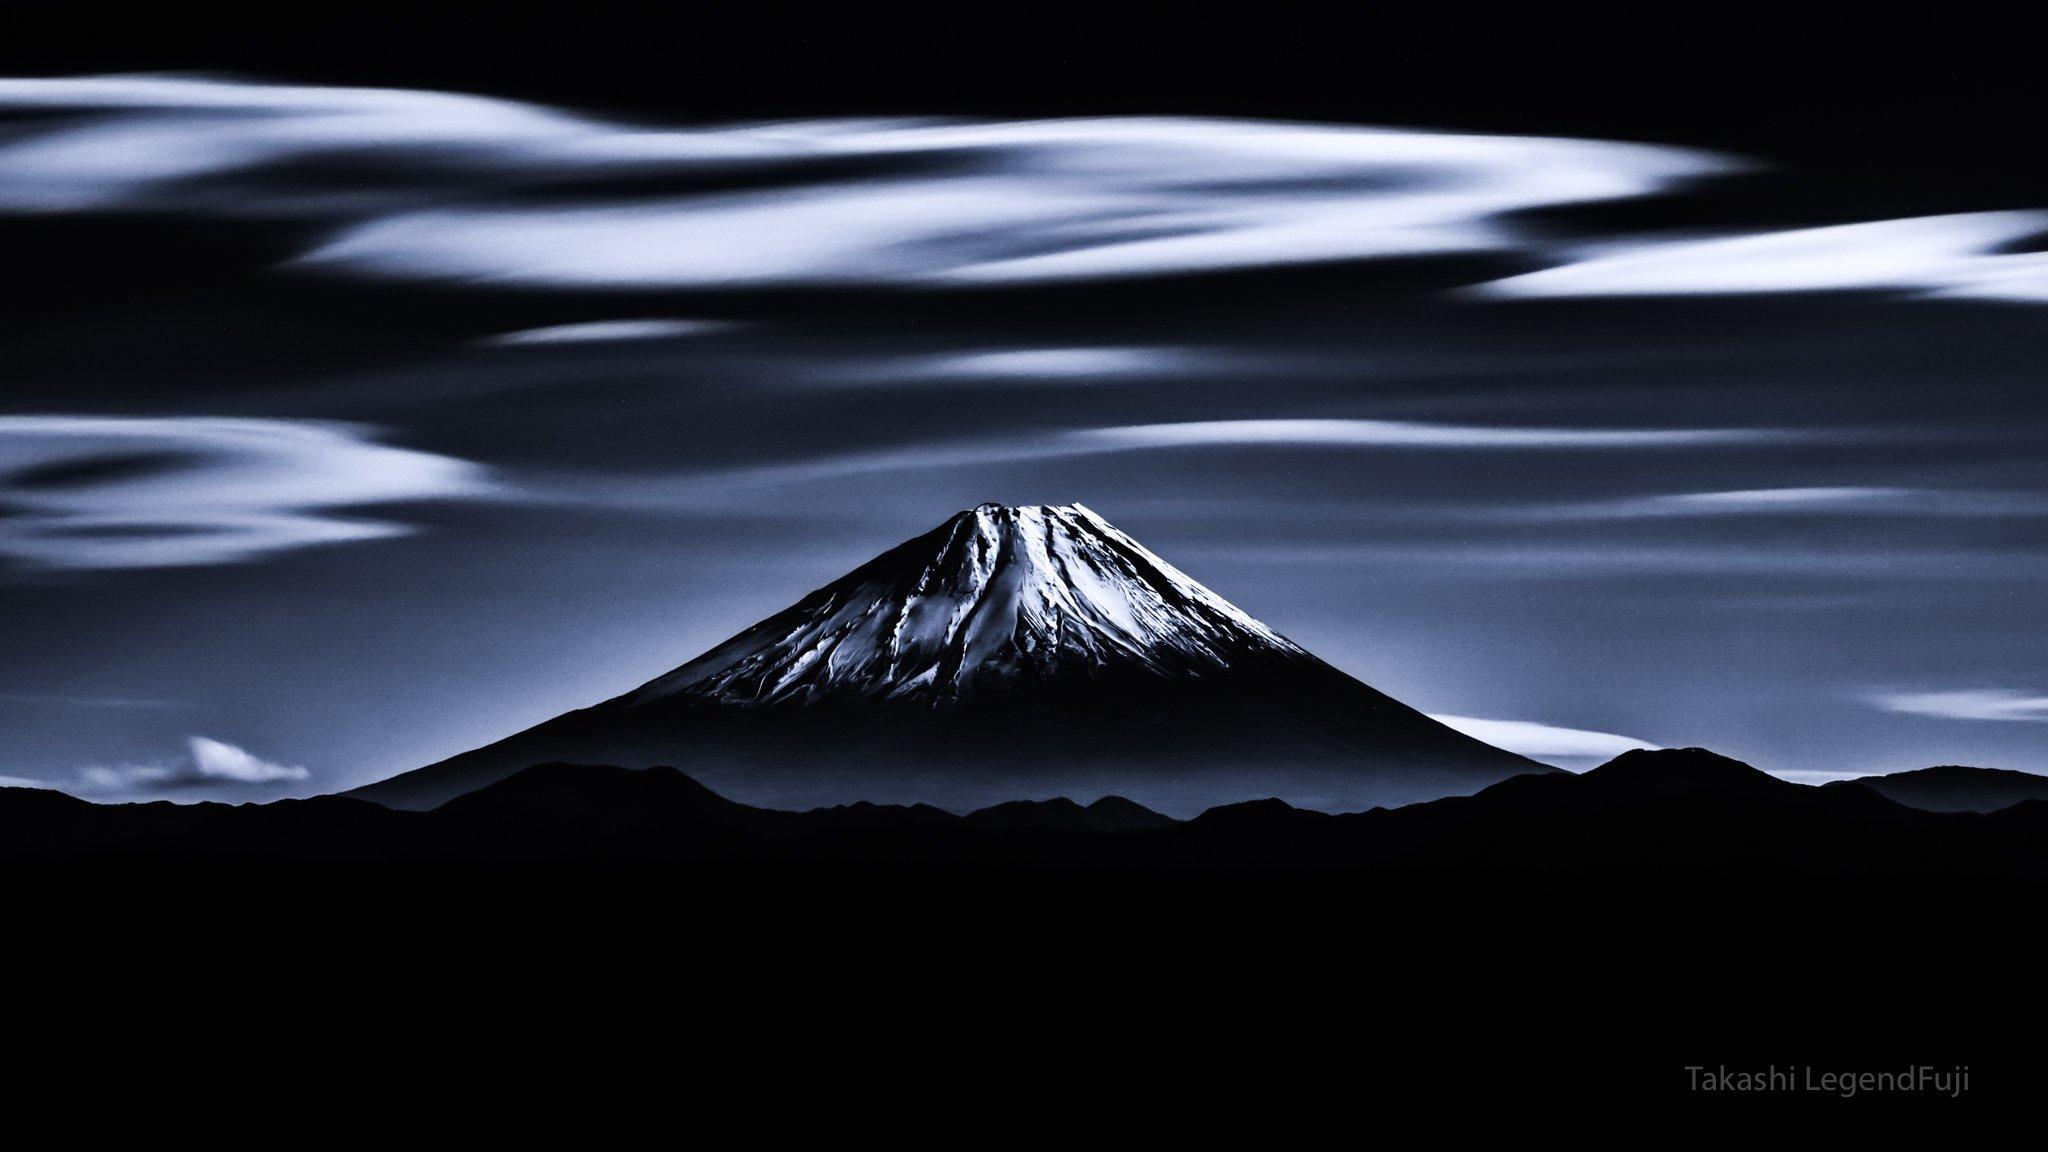 Fuji,mountain,Japan,clouds,landscapes,beautiful,amazing,sky,blue,, Takashi